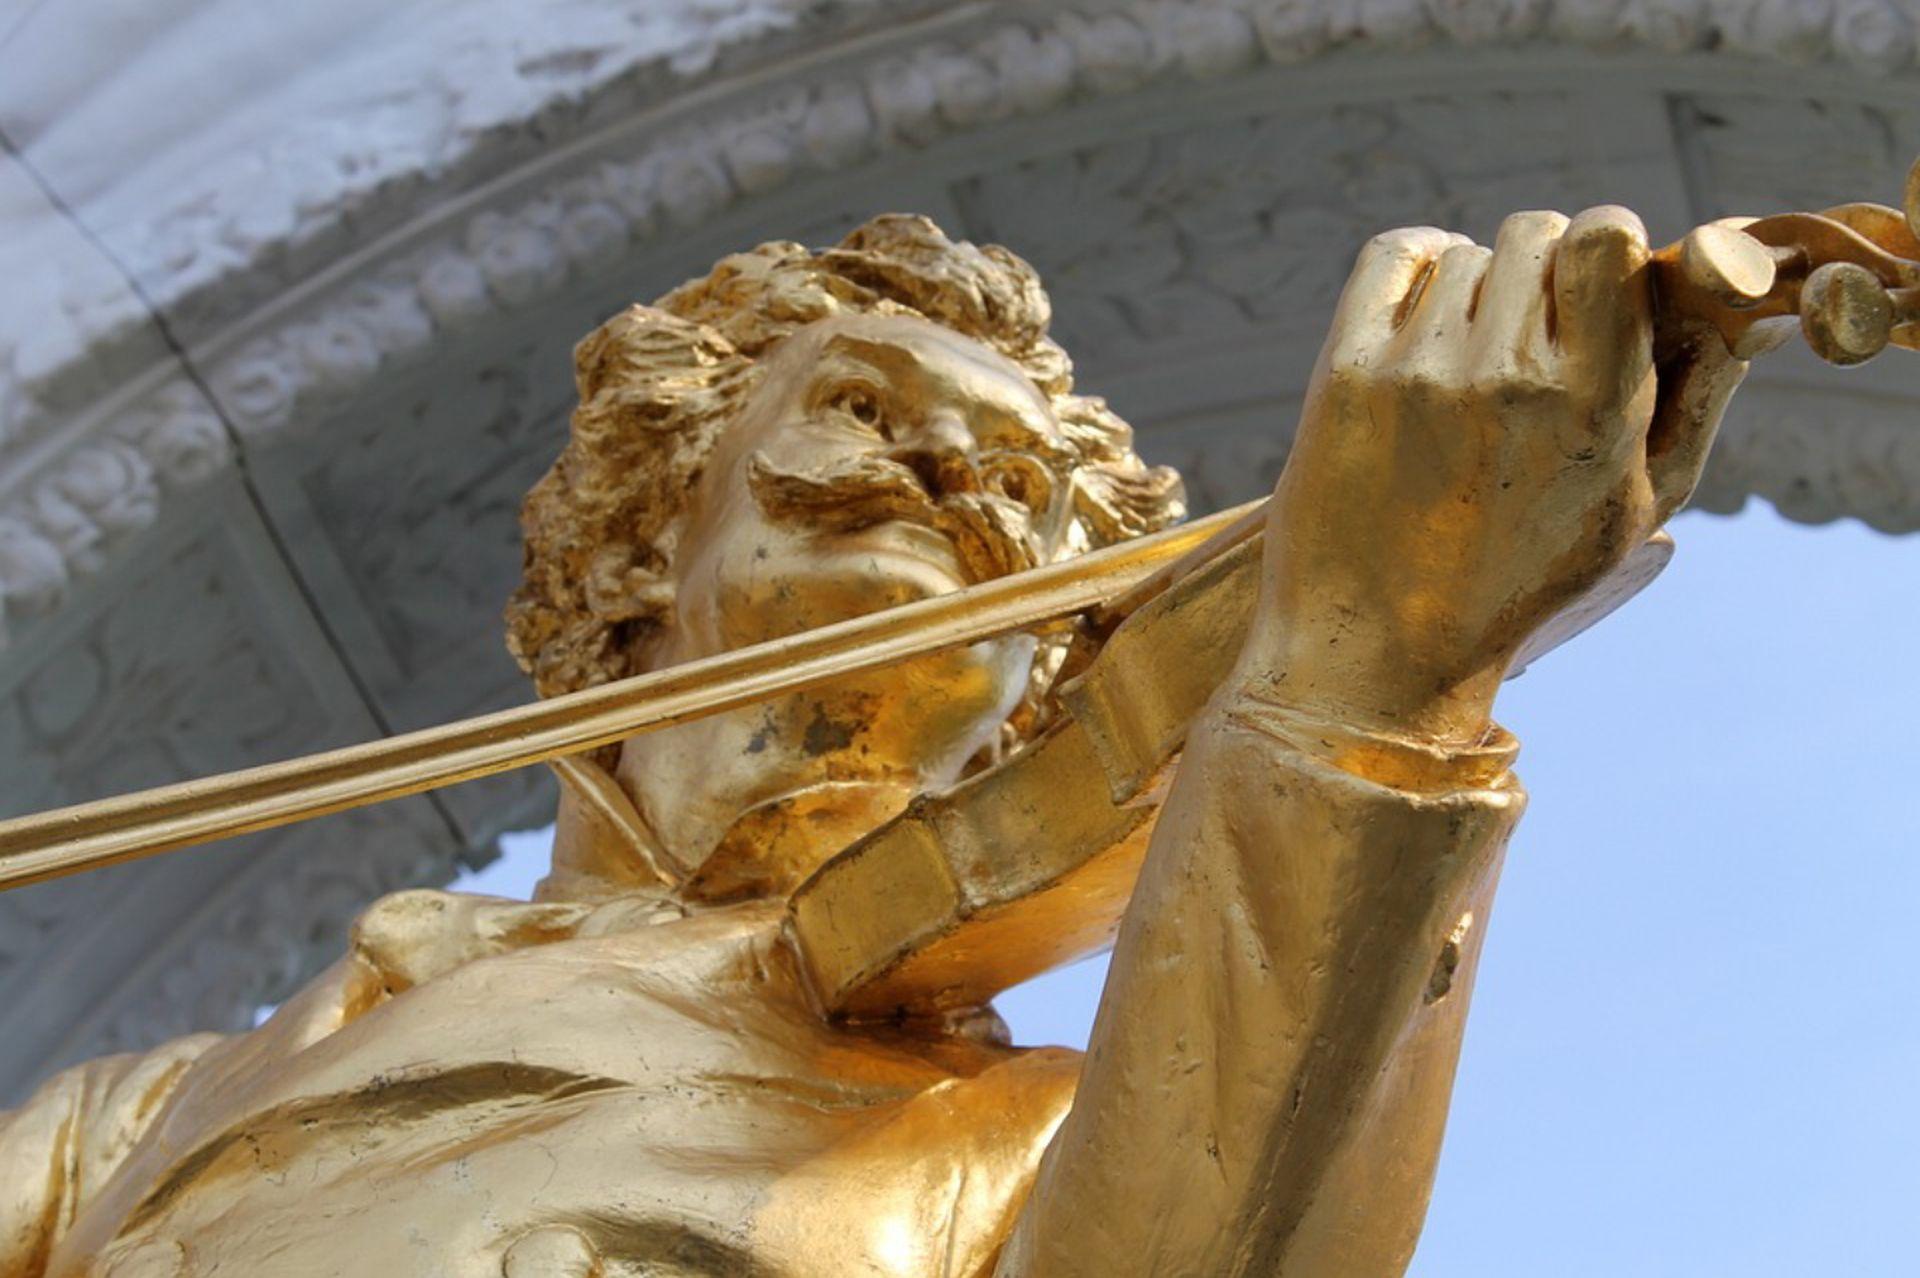 Johann Strauss, gran compositor austriaco conocido especialmente por sus valses, como El Danubio azul.